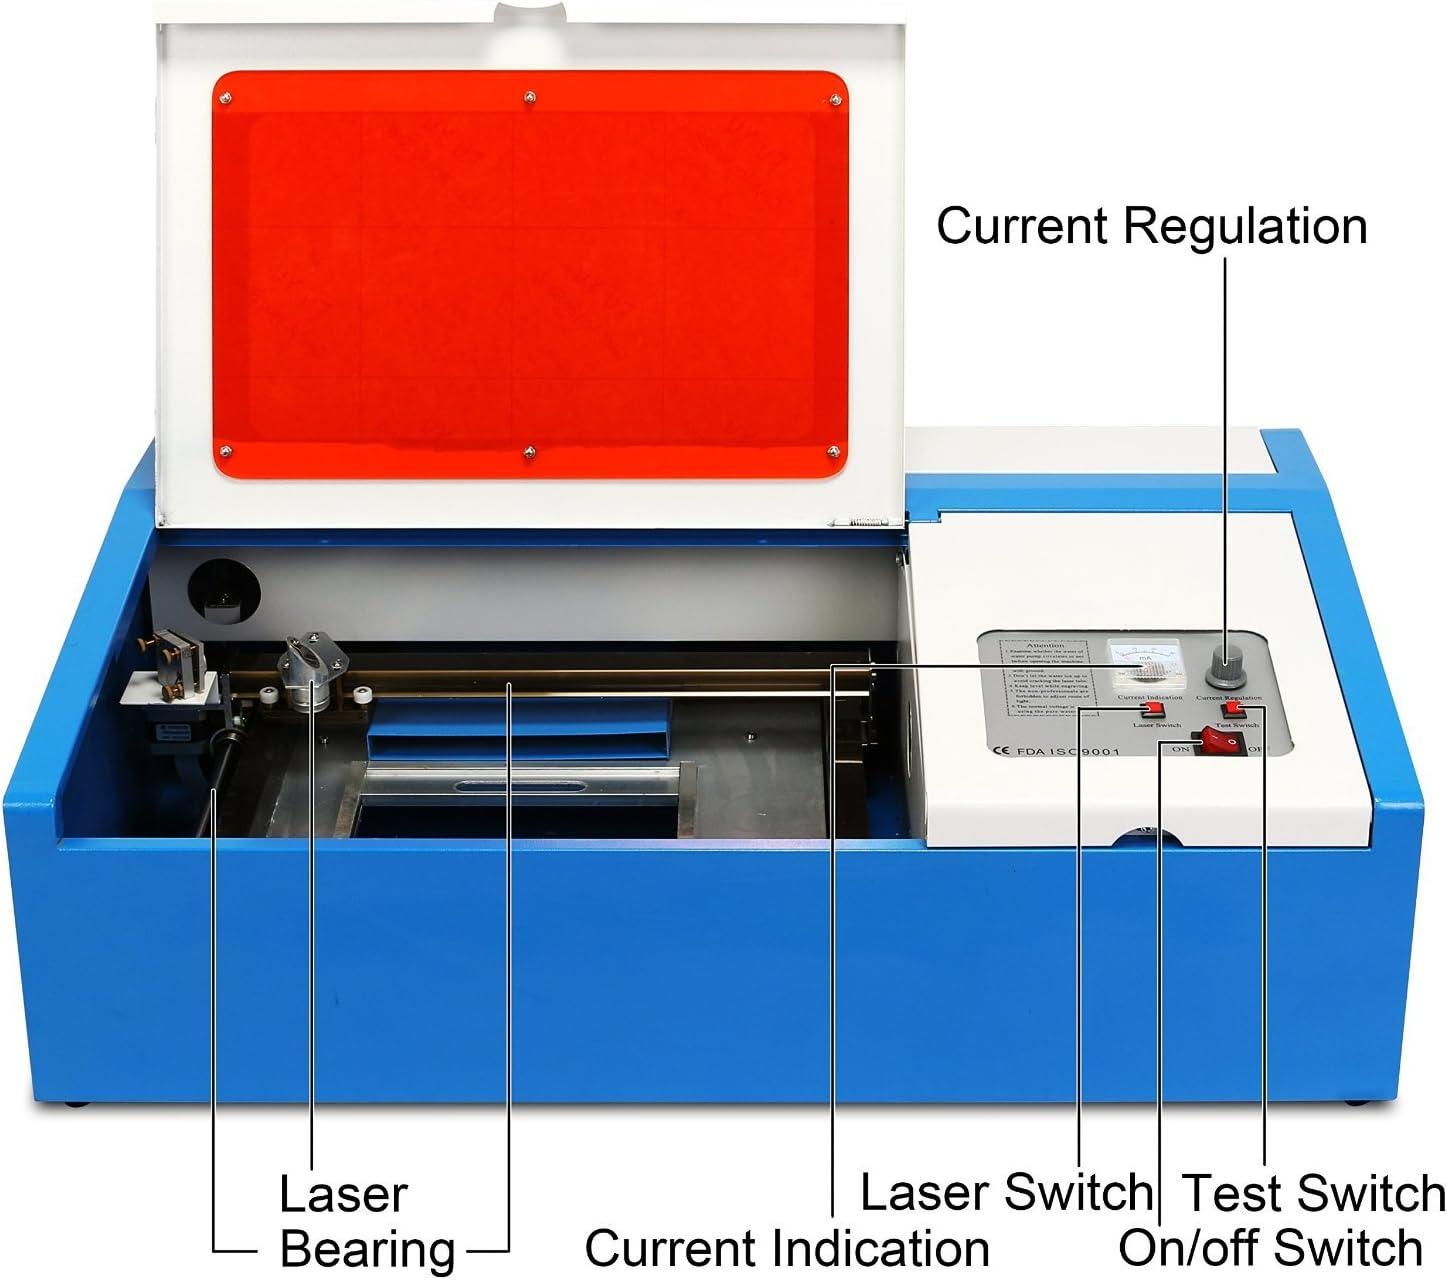 16 X 24 Mophorn Laser Engraving Machine Laser Engraver Laser Engraving Cutting Machine for Arts and Crafts